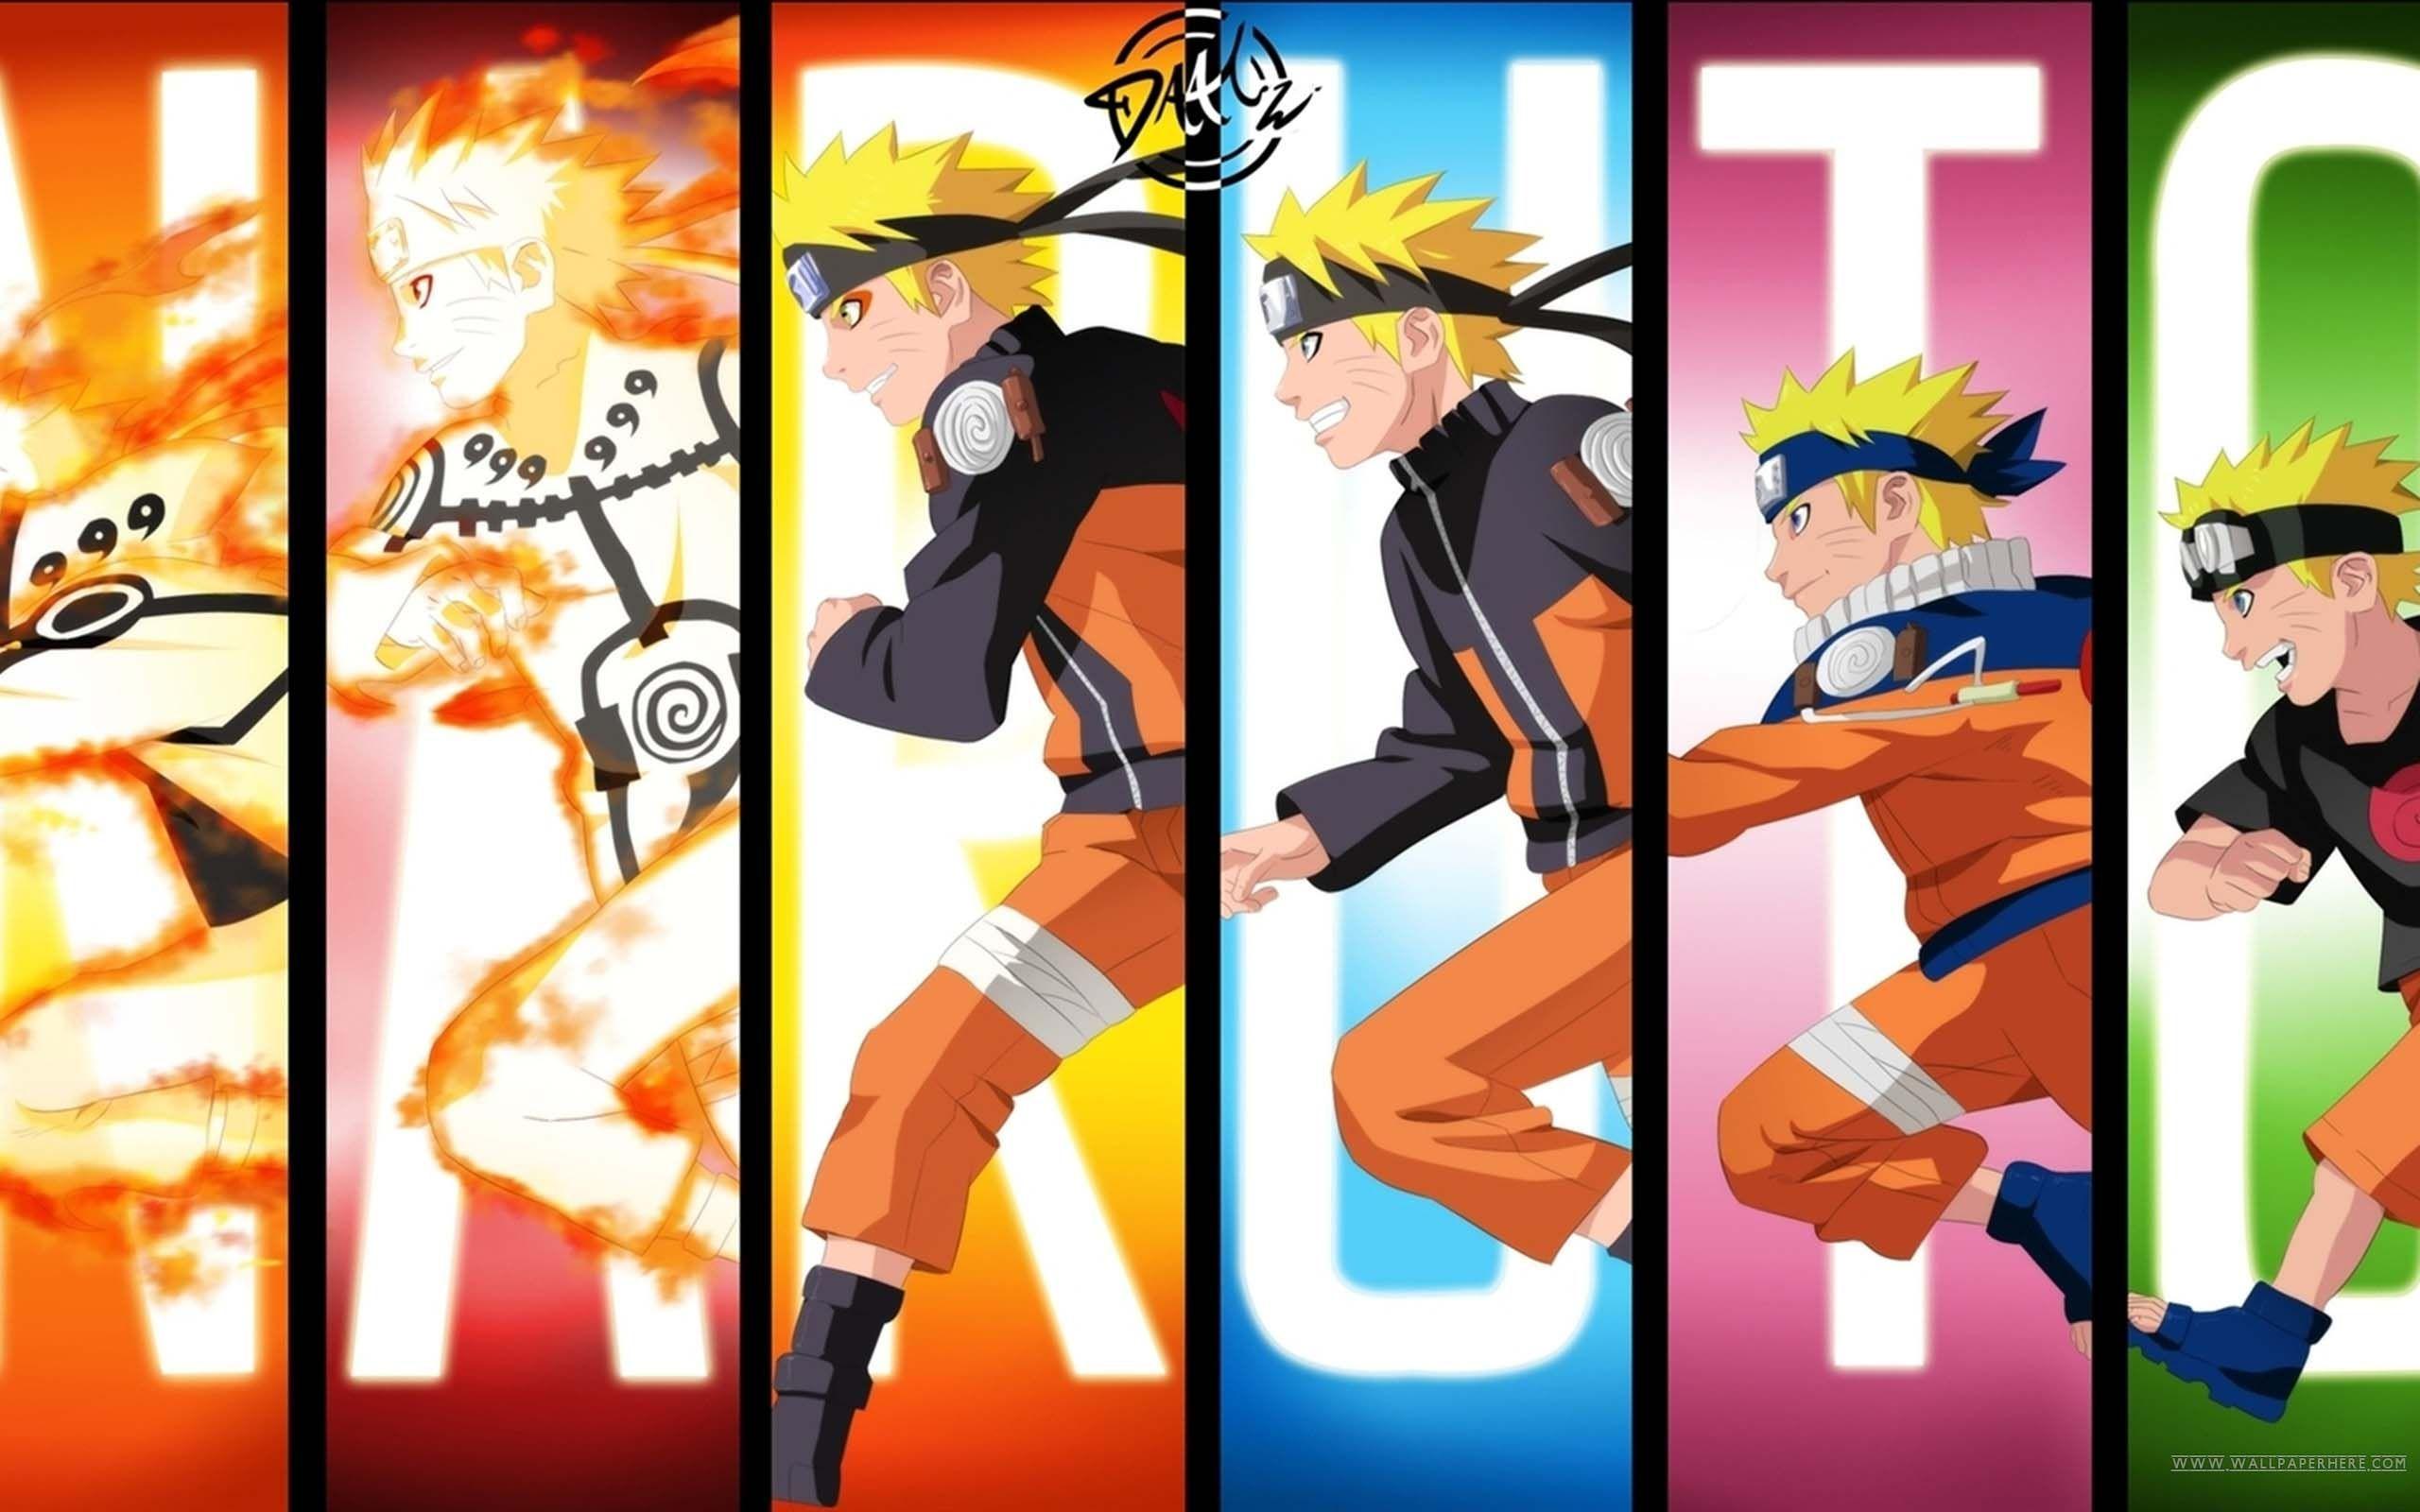 Naruto Wallpapers Desktop Background Em Papel De Parede 1080p Hd Wallpaper Naruto Shippuden Naruto Pictures Best Naruto Wallpapers